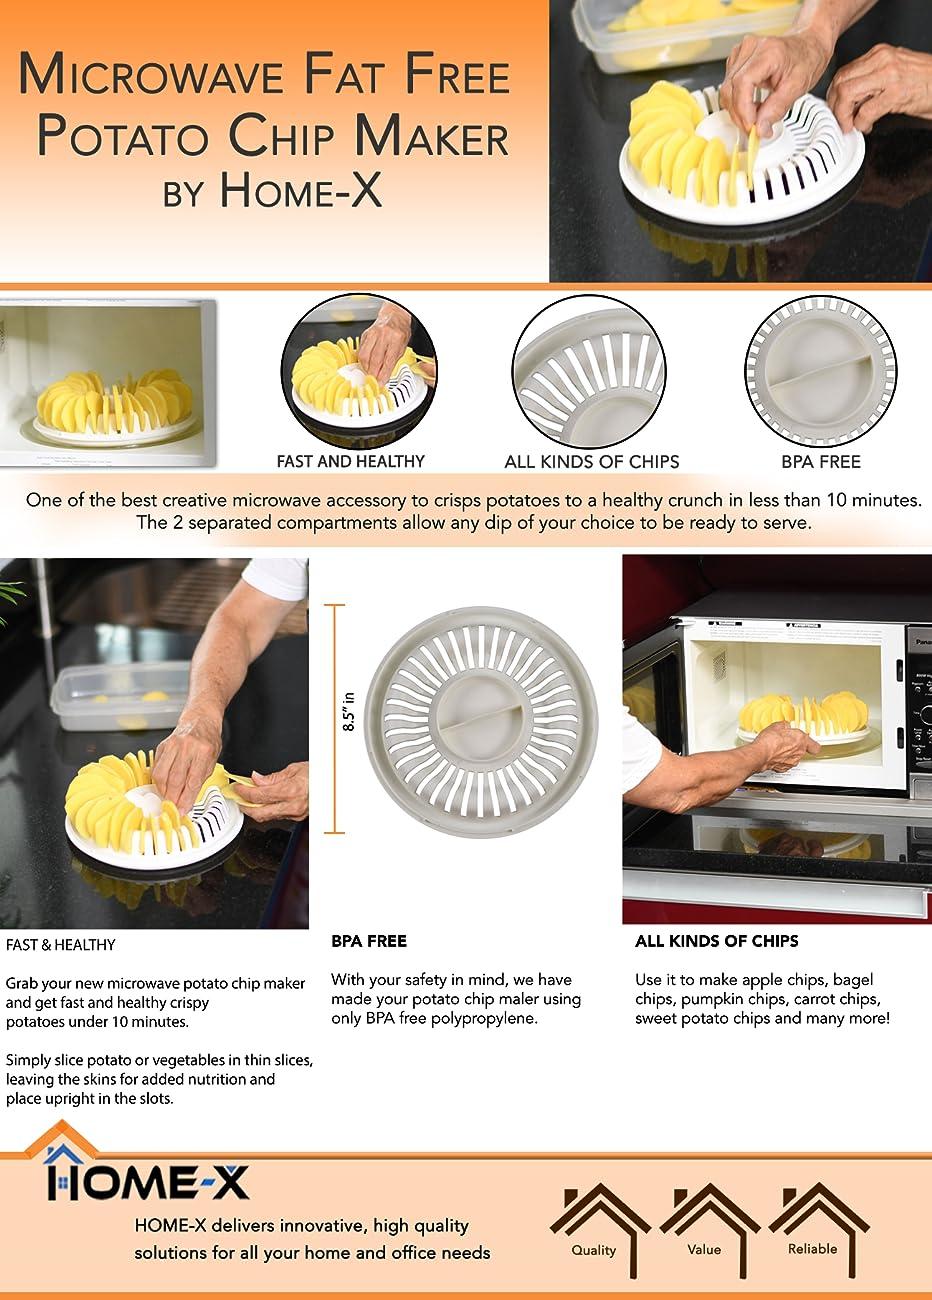 Amazon.com: Microondas Fat Free Herramienta Eléctrica Home ...